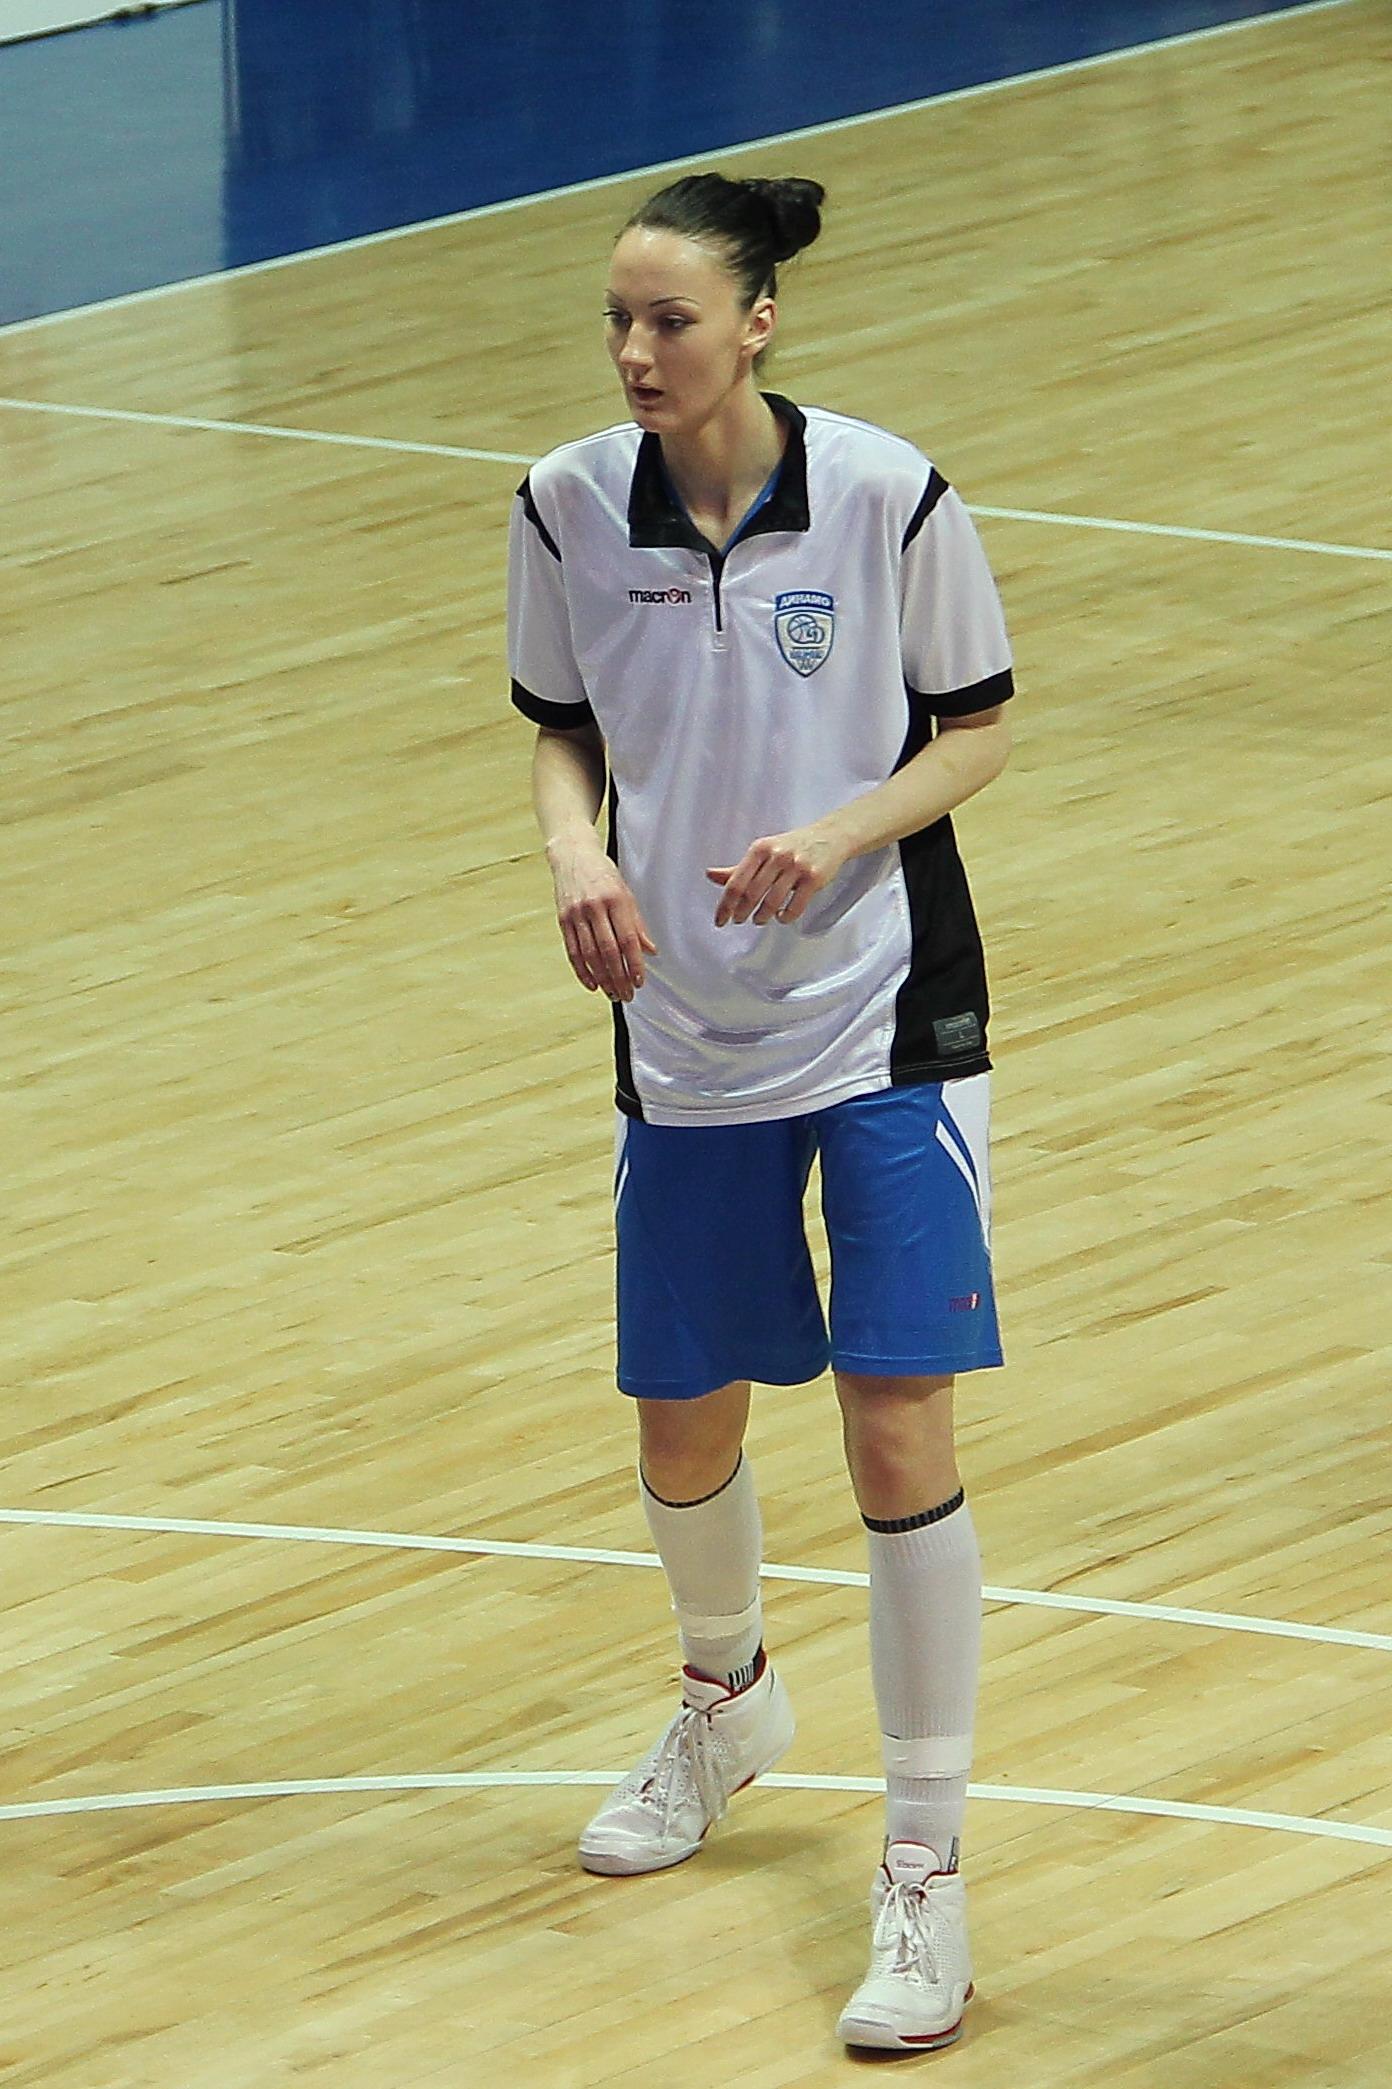 Russian girl tall Svetlana Khorkina